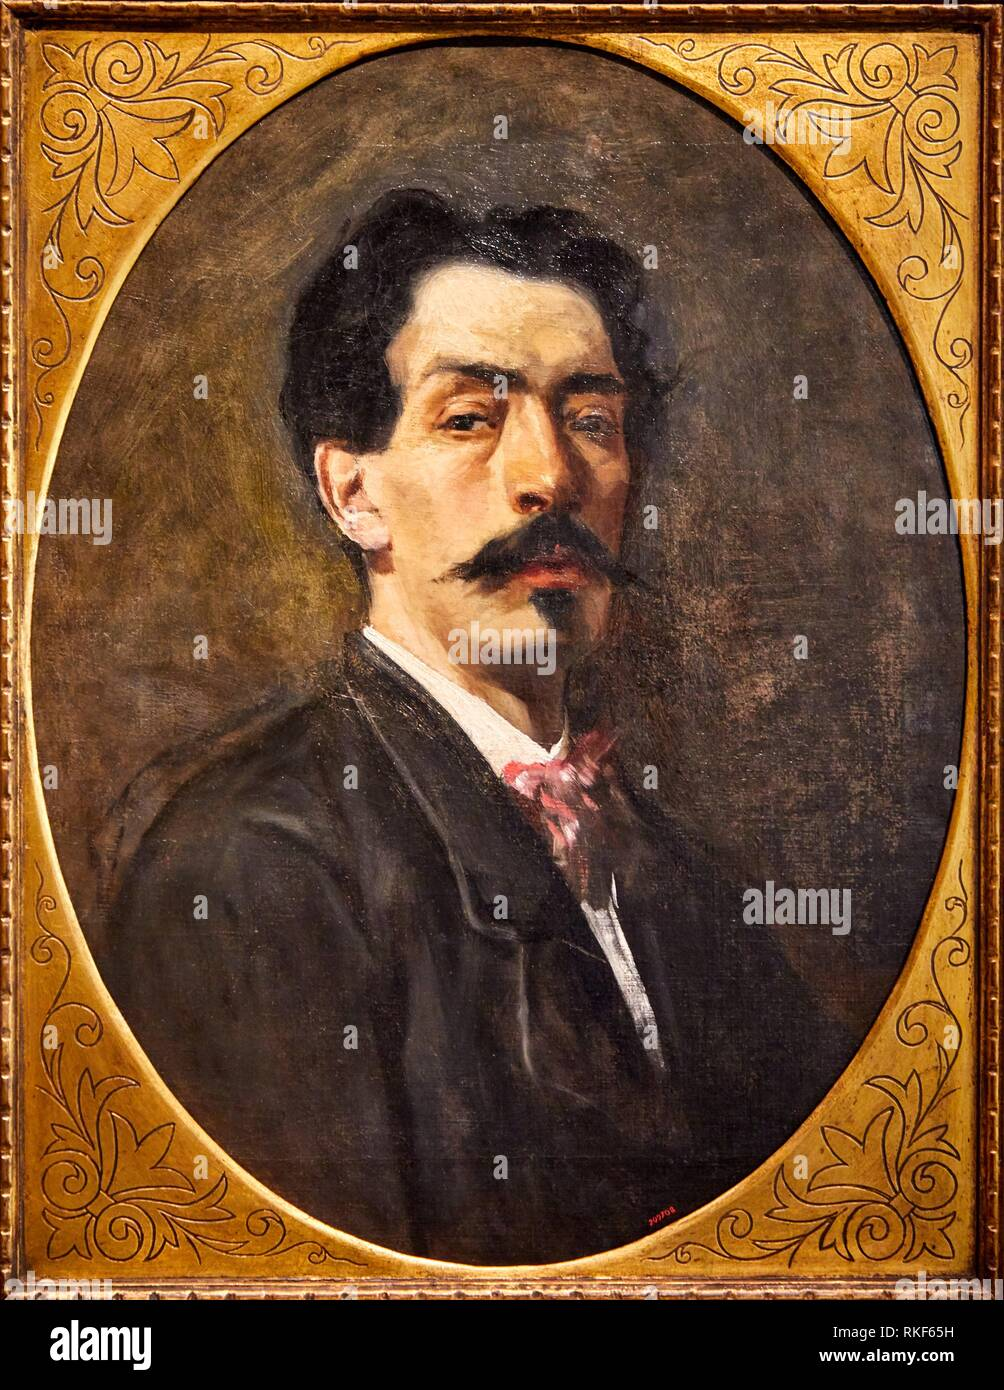 '''Self-portrait'', c. 1885, Attributed to Joaquim Agrassot, National Museum of Catalan Art, Museu Nacional d Art de Catalunya, MNAC, Barcelona, - Stock Image